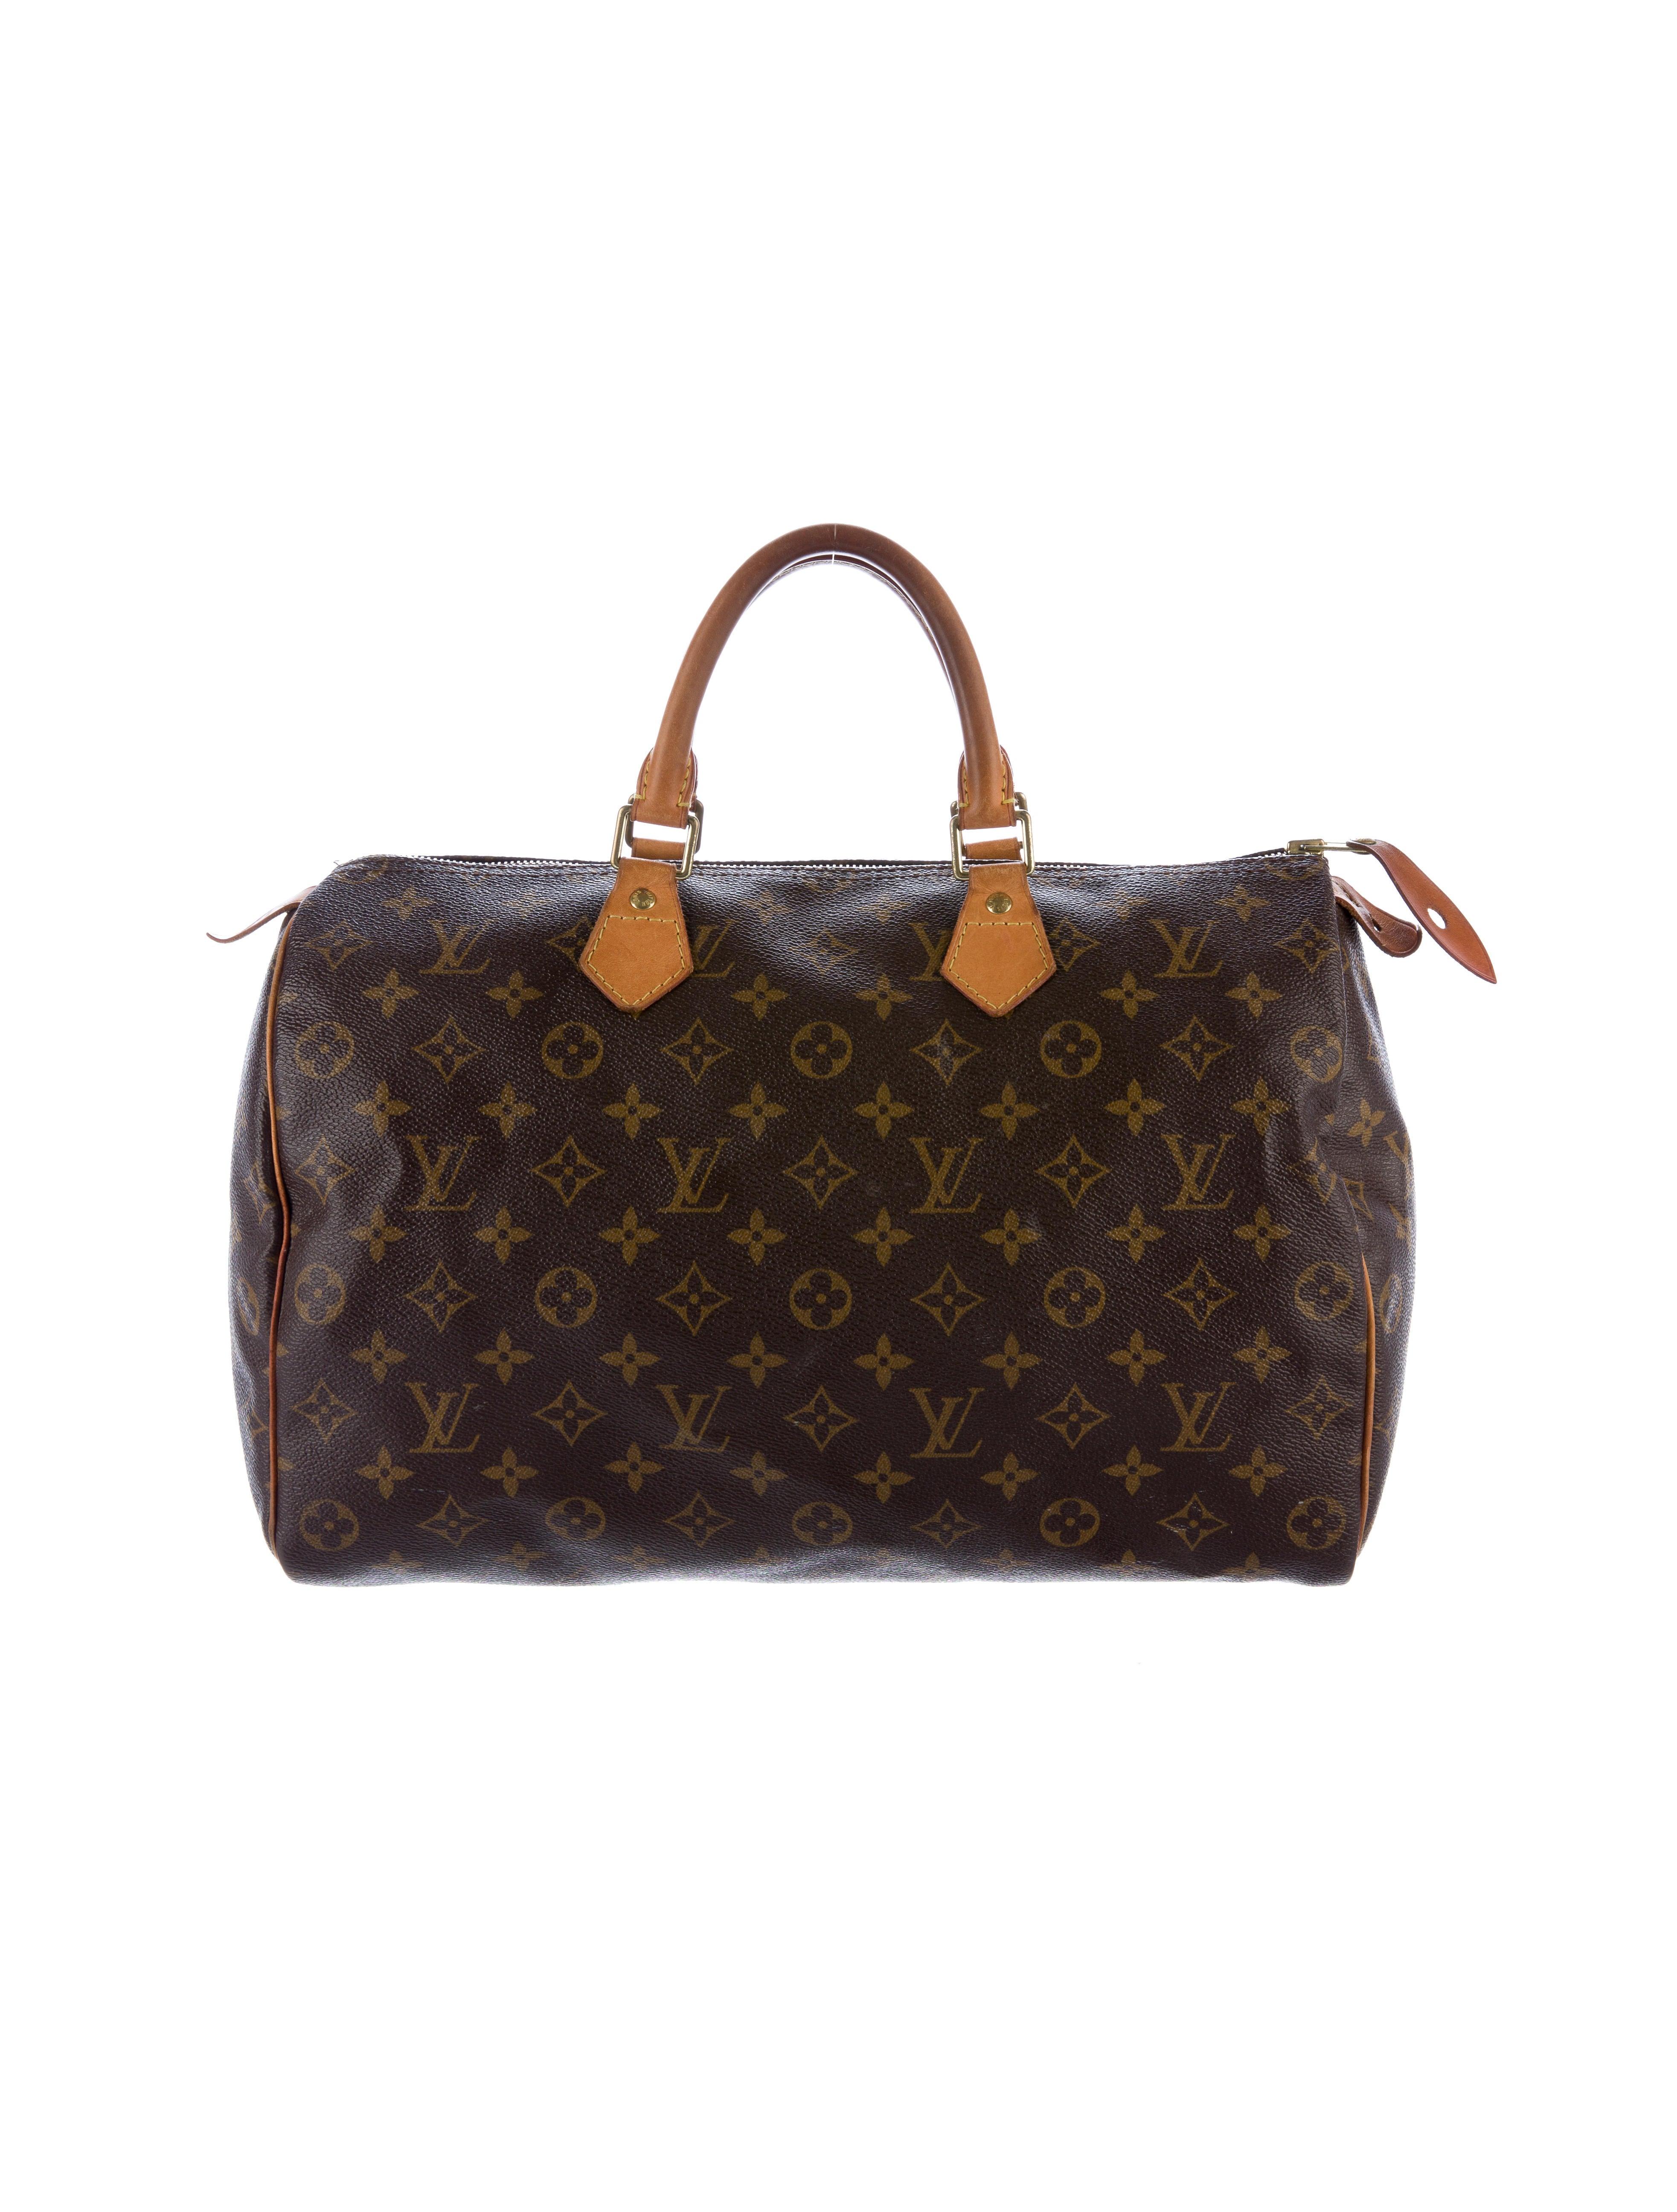 Louis vuitton monogram speedy 35 handbags lou116242 for Louis vuitton miroir speedy 35